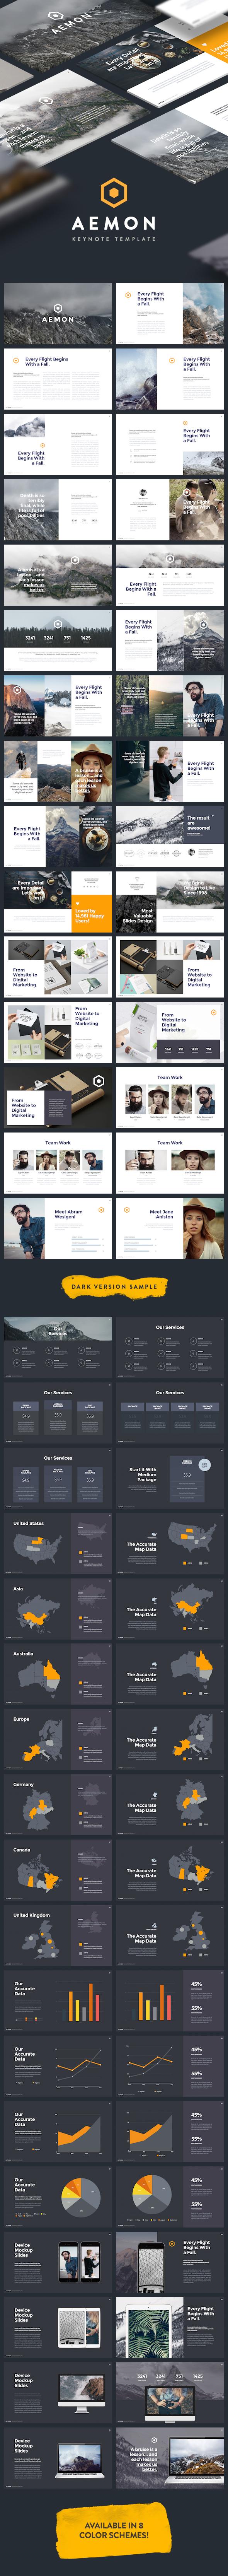 AEMON - Minimal & Creative Keynote Template - Keynote Templates Presentation Templates